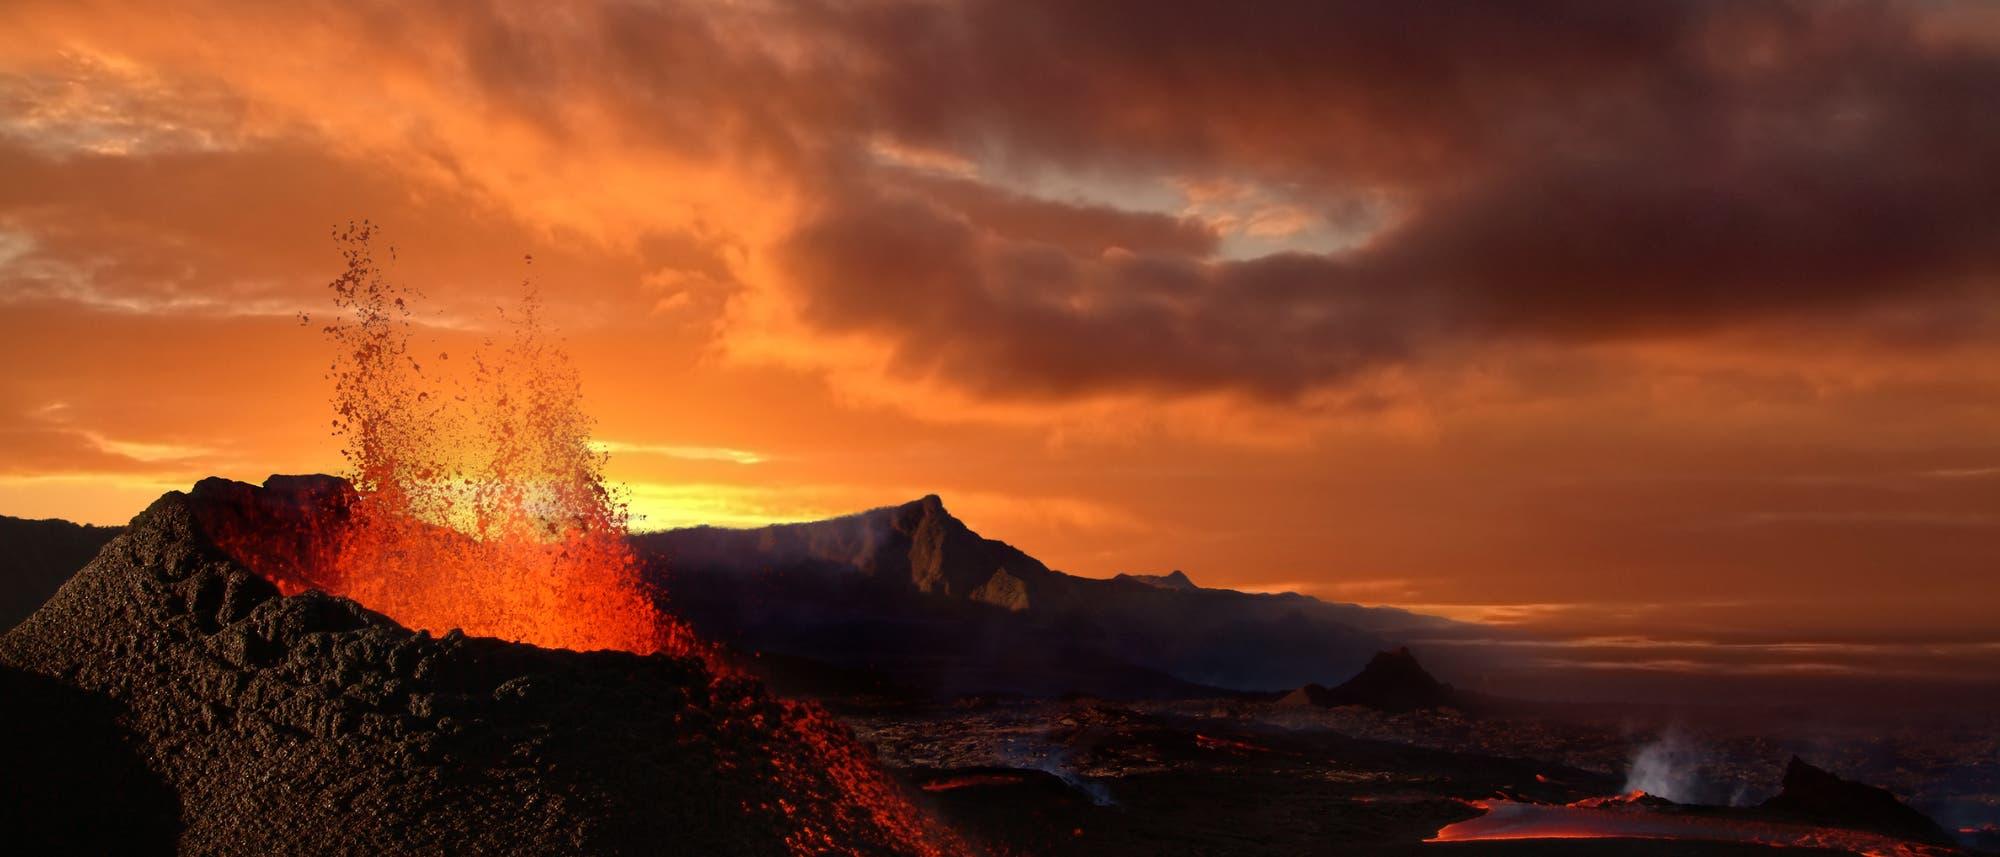 Vulkankegel mit gelbem Himmel.